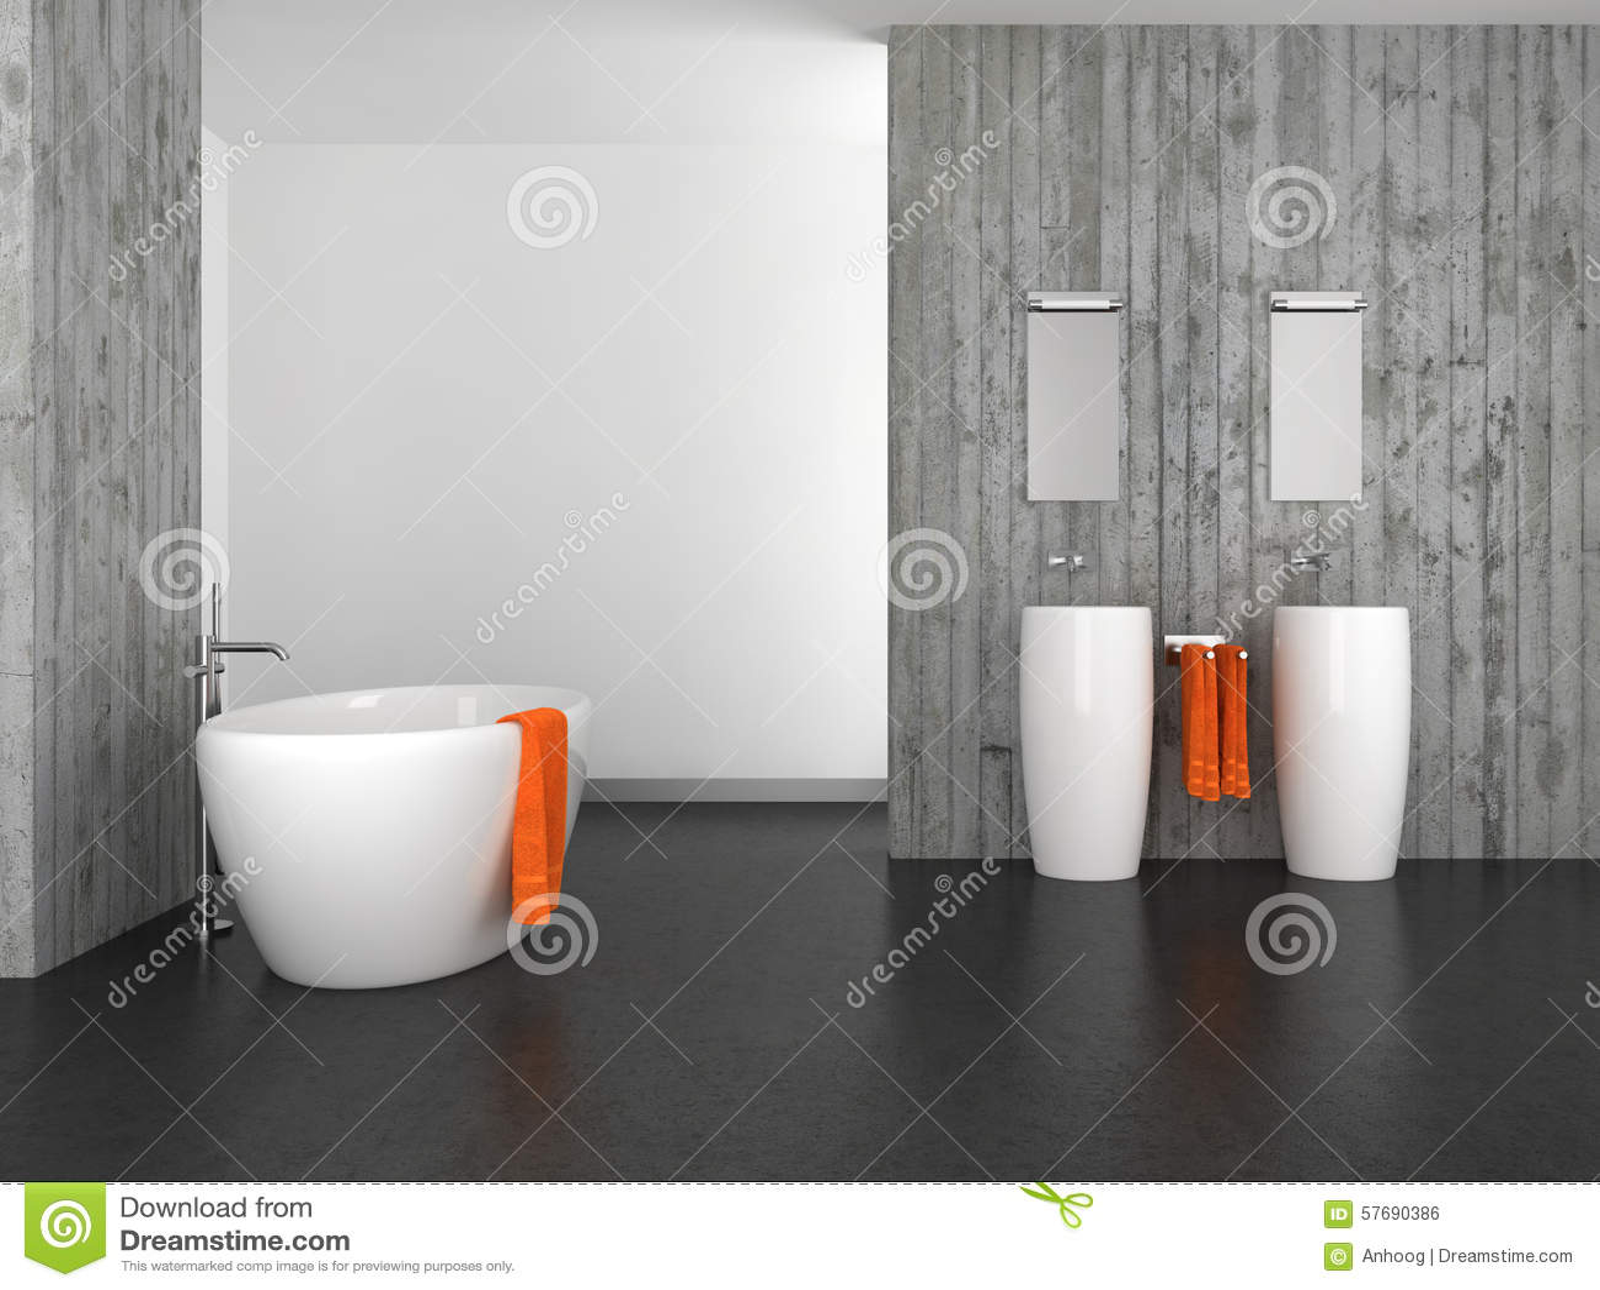 Dubbla handfat i badrum foton – 15 dubbla handfat i badrum bilder ...